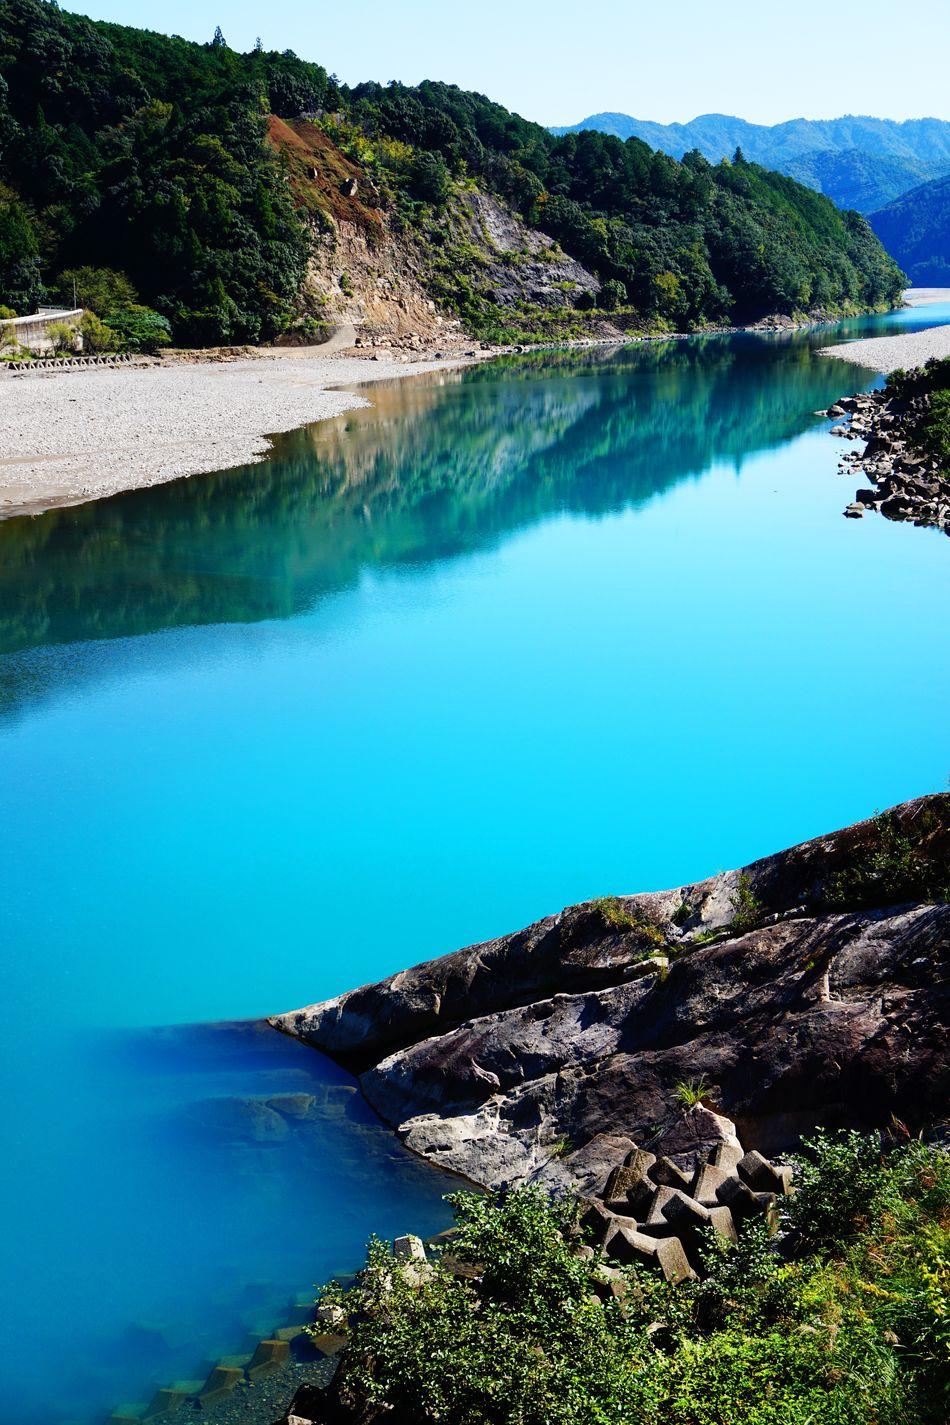 2015  Beauty In Nature Blue Water Bule River Coal Japan Kumano River Landscape Mountain Nature Outdoors River Scenics Sky Tree Wakayama Water World Heritage 川 温泉 熊野川